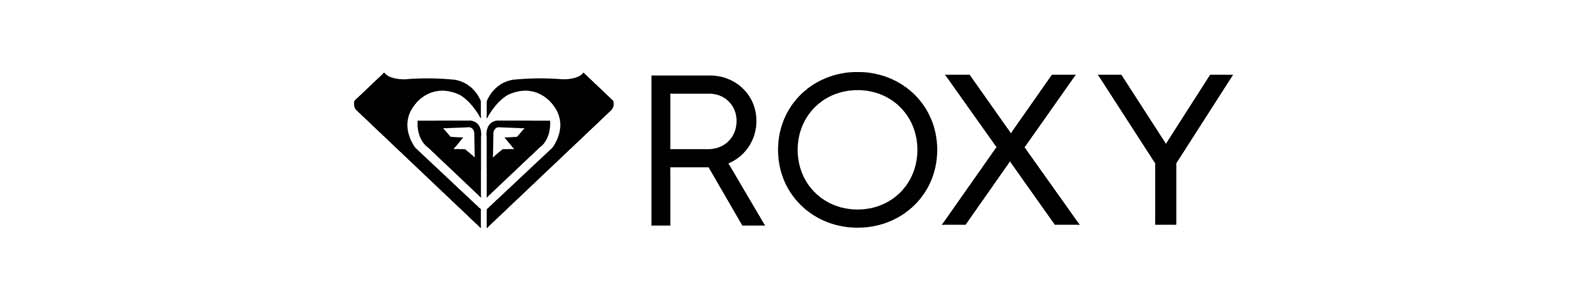 Roxy brand header image